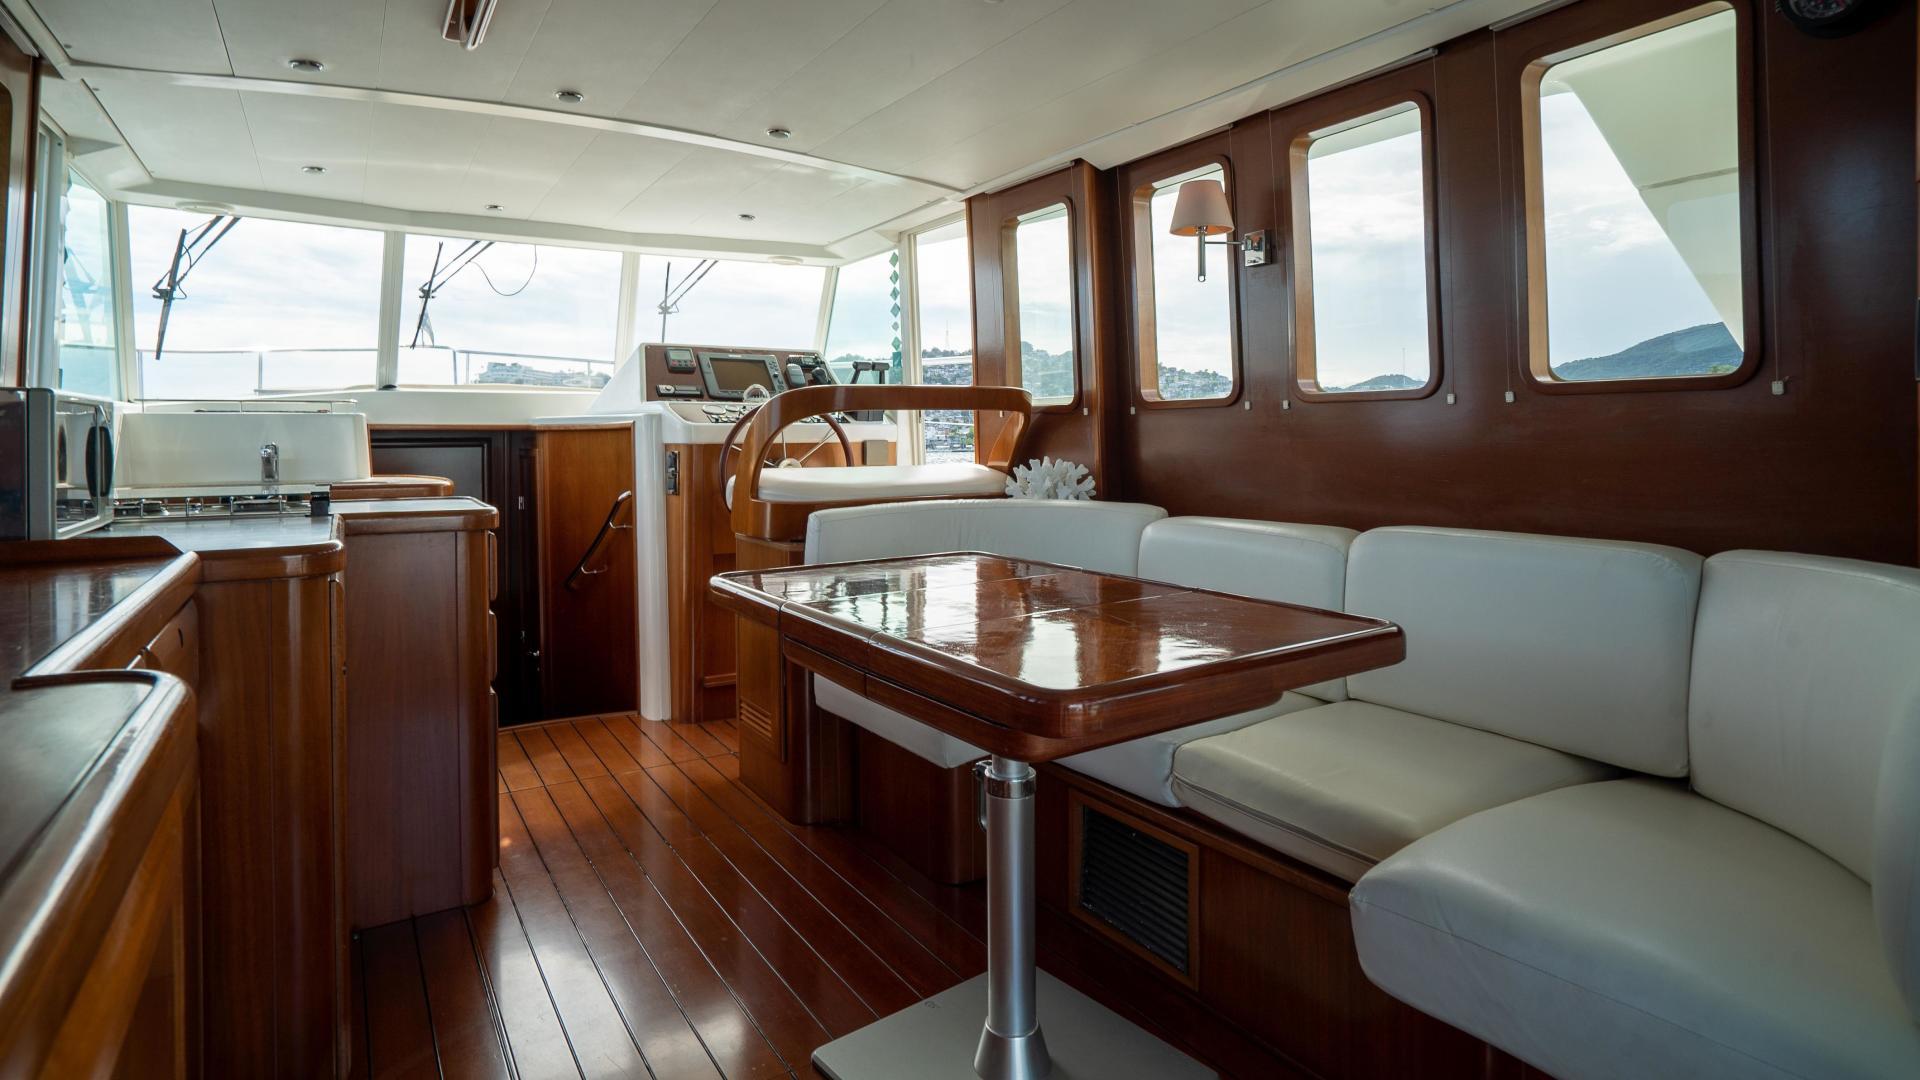 Beneteau-Swift Trawler 2008-Amadeus Acapulco-Mexico-1487066 | Thumbnail